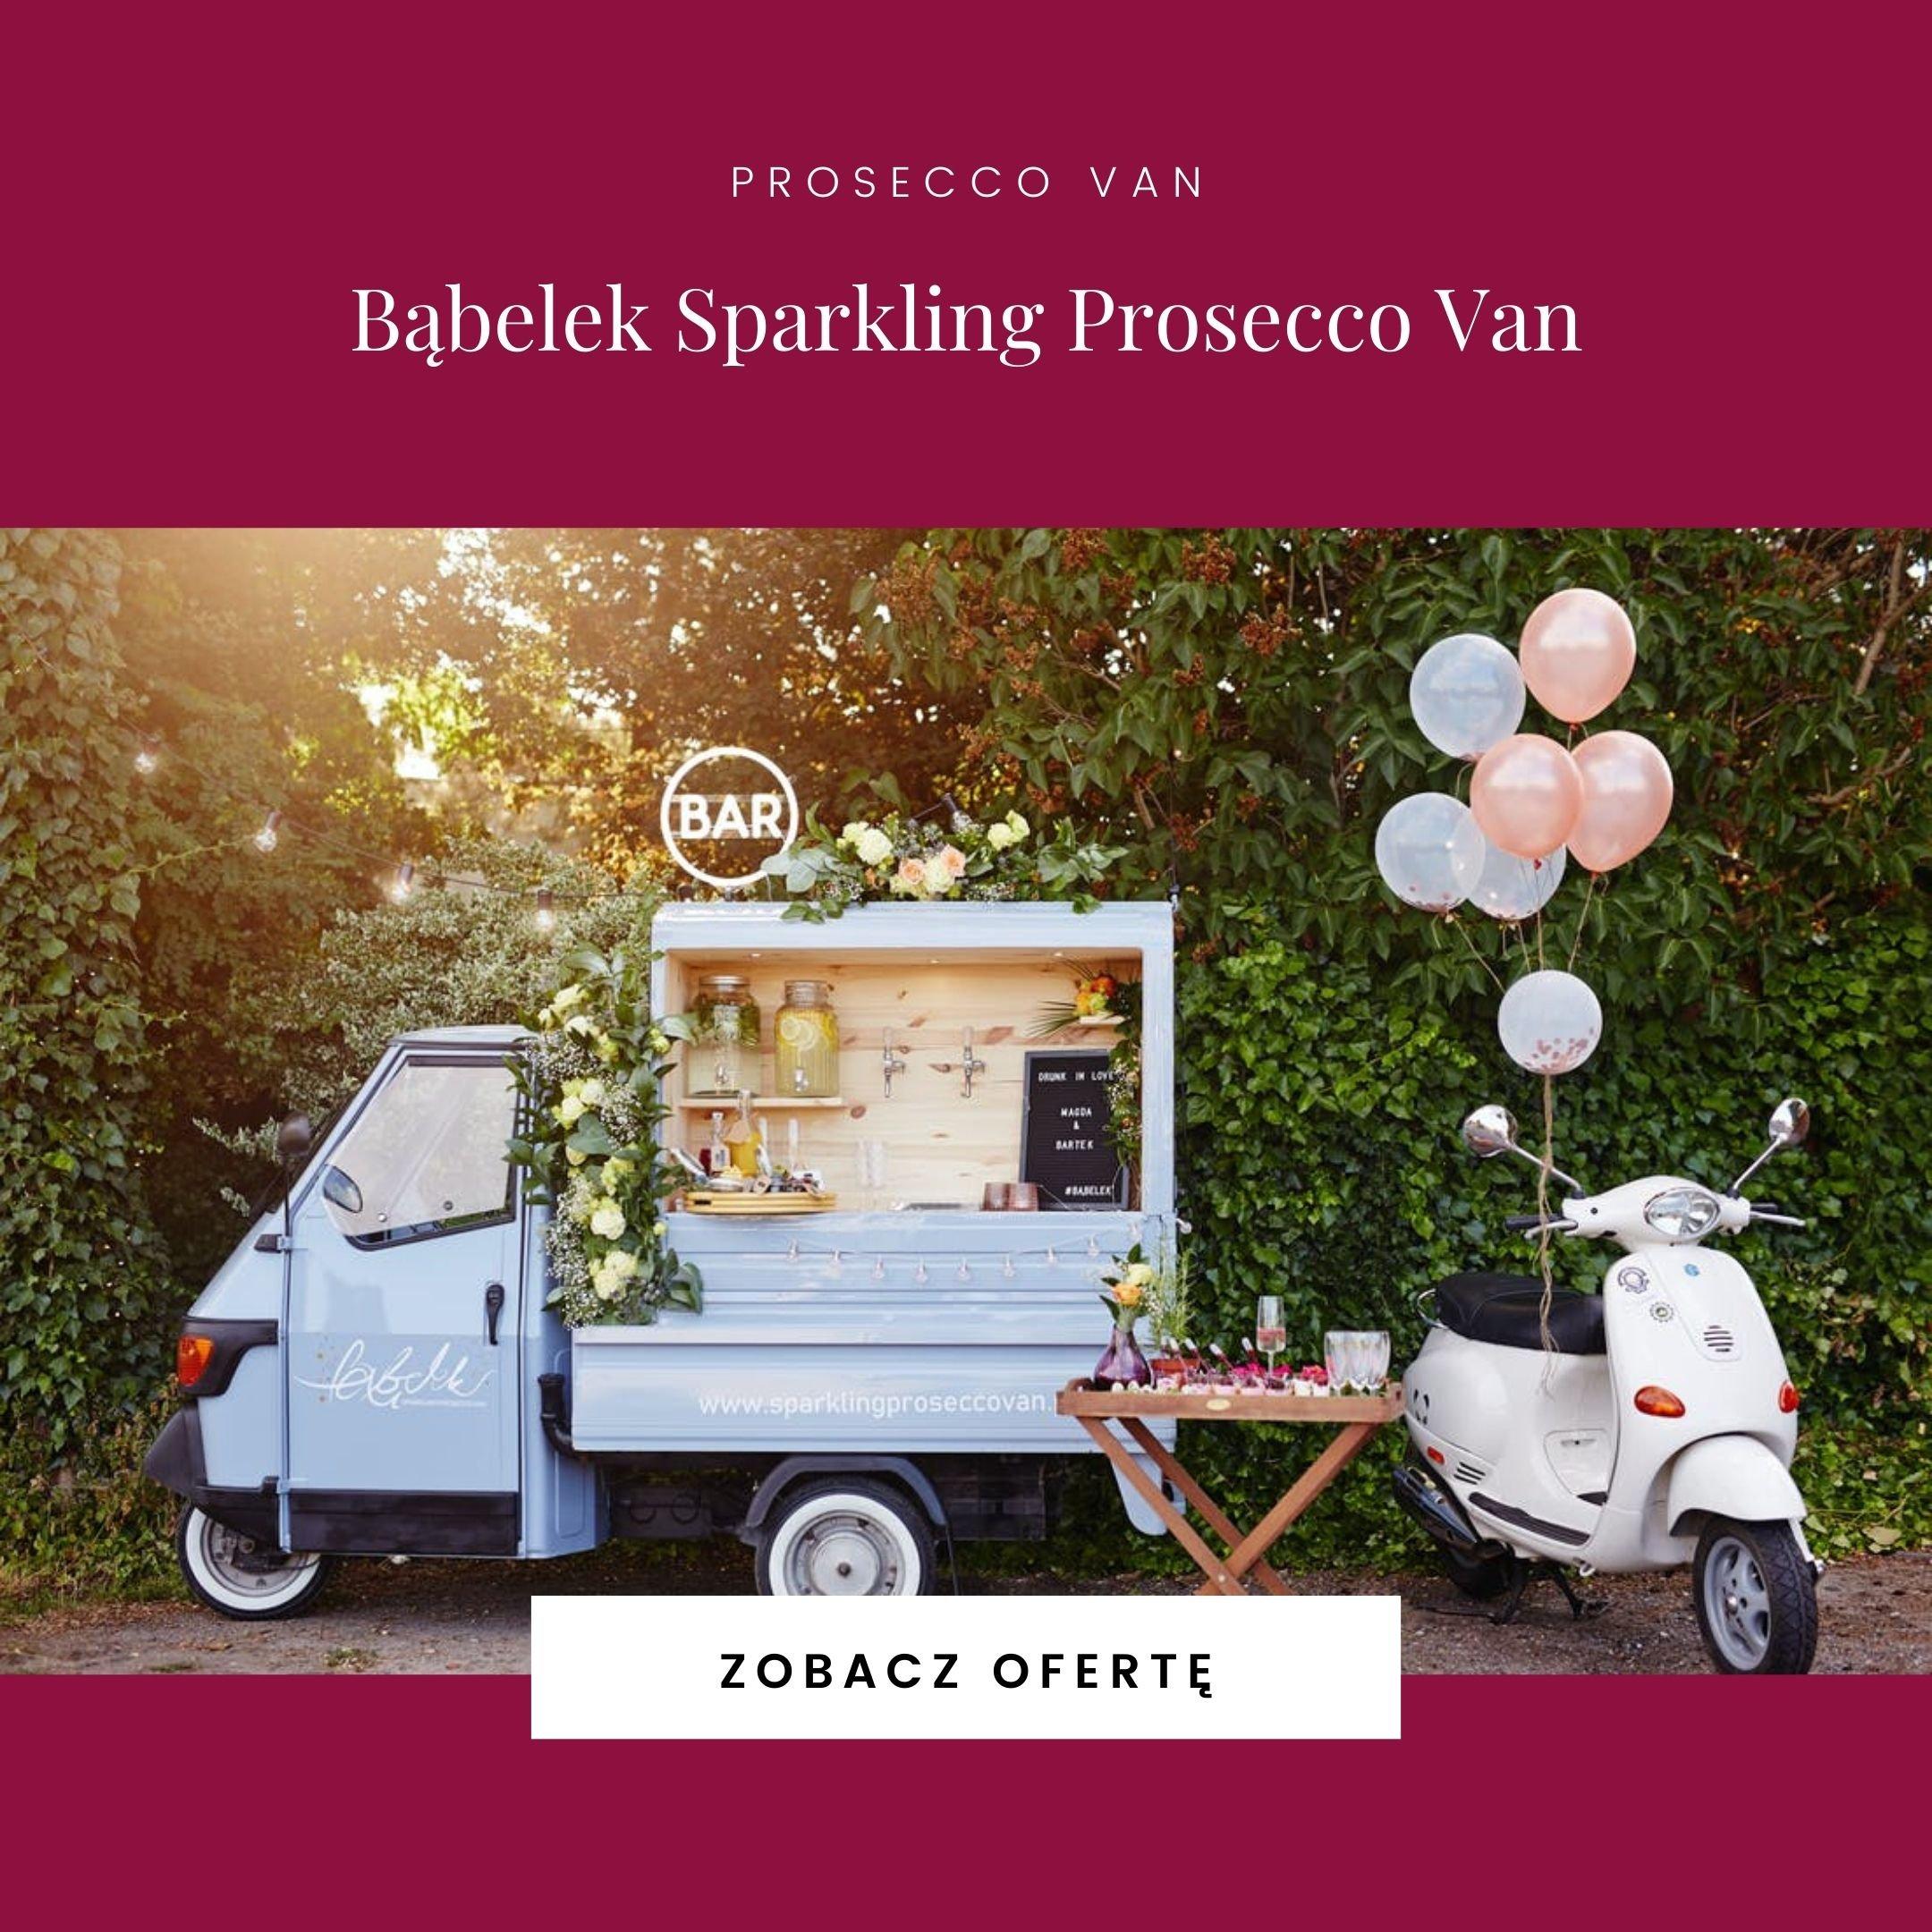 Bąbelek Sparkling Prosecco Van